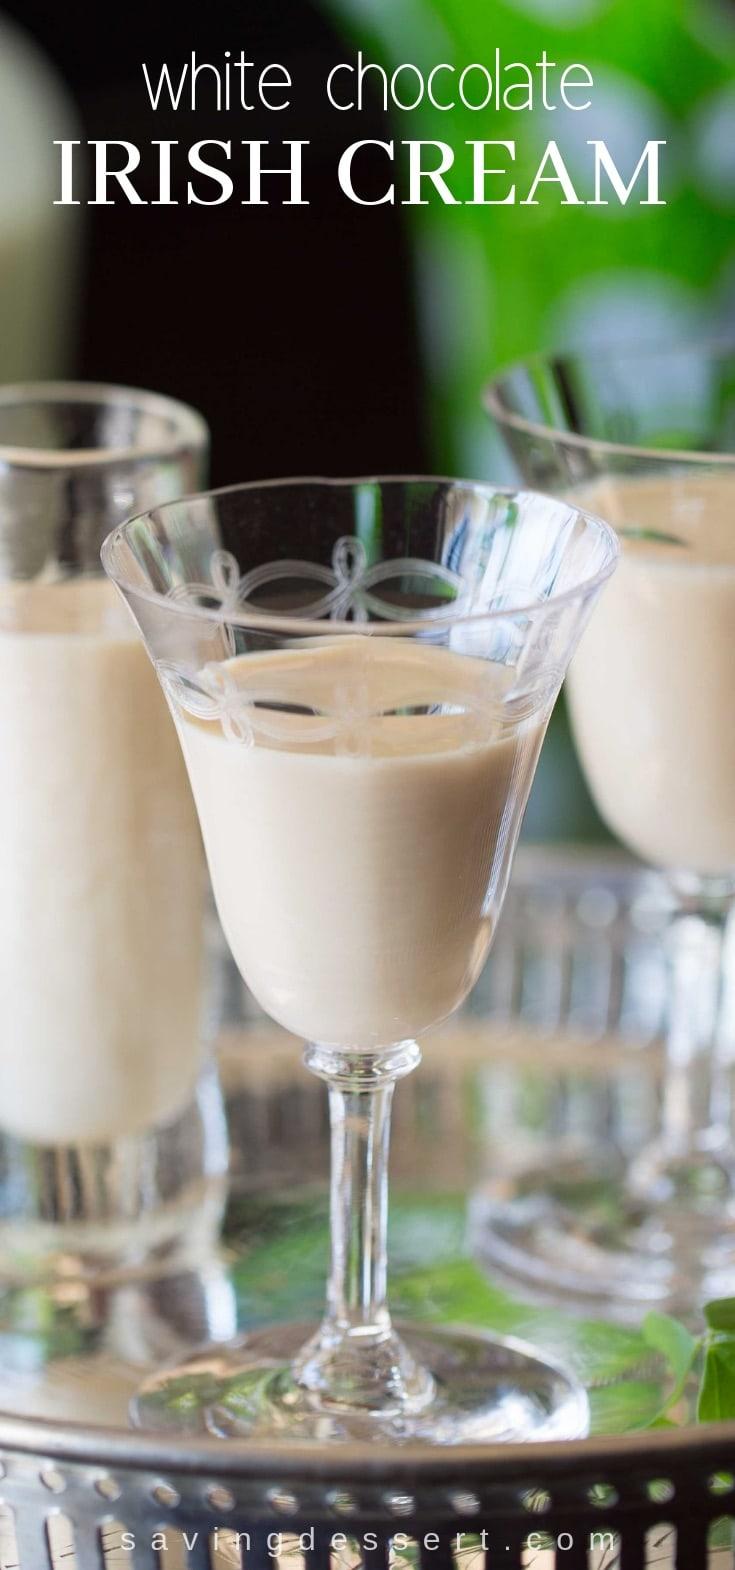 White Chocolate Irish Cream - Creamy, dreamy, smooth and delicious! A wonderful after dinner drink that tastes like dessert! #Irish #Irishcream #whitechocolate #cordial #afterdinner #beverage #cocktail #stpatricksday